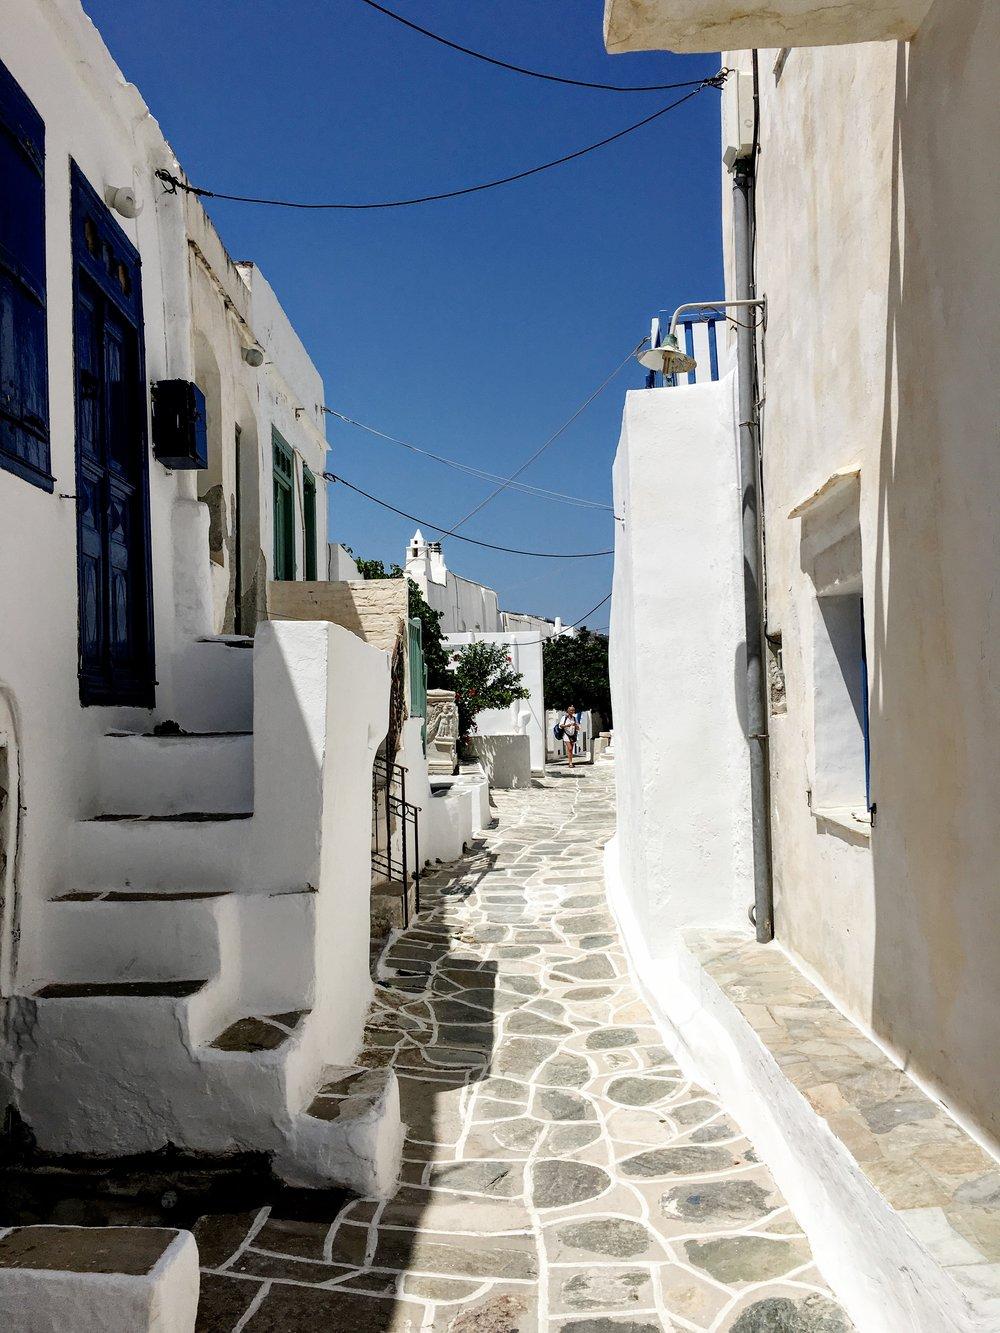 Travel Food People - Kastro, Sifnos